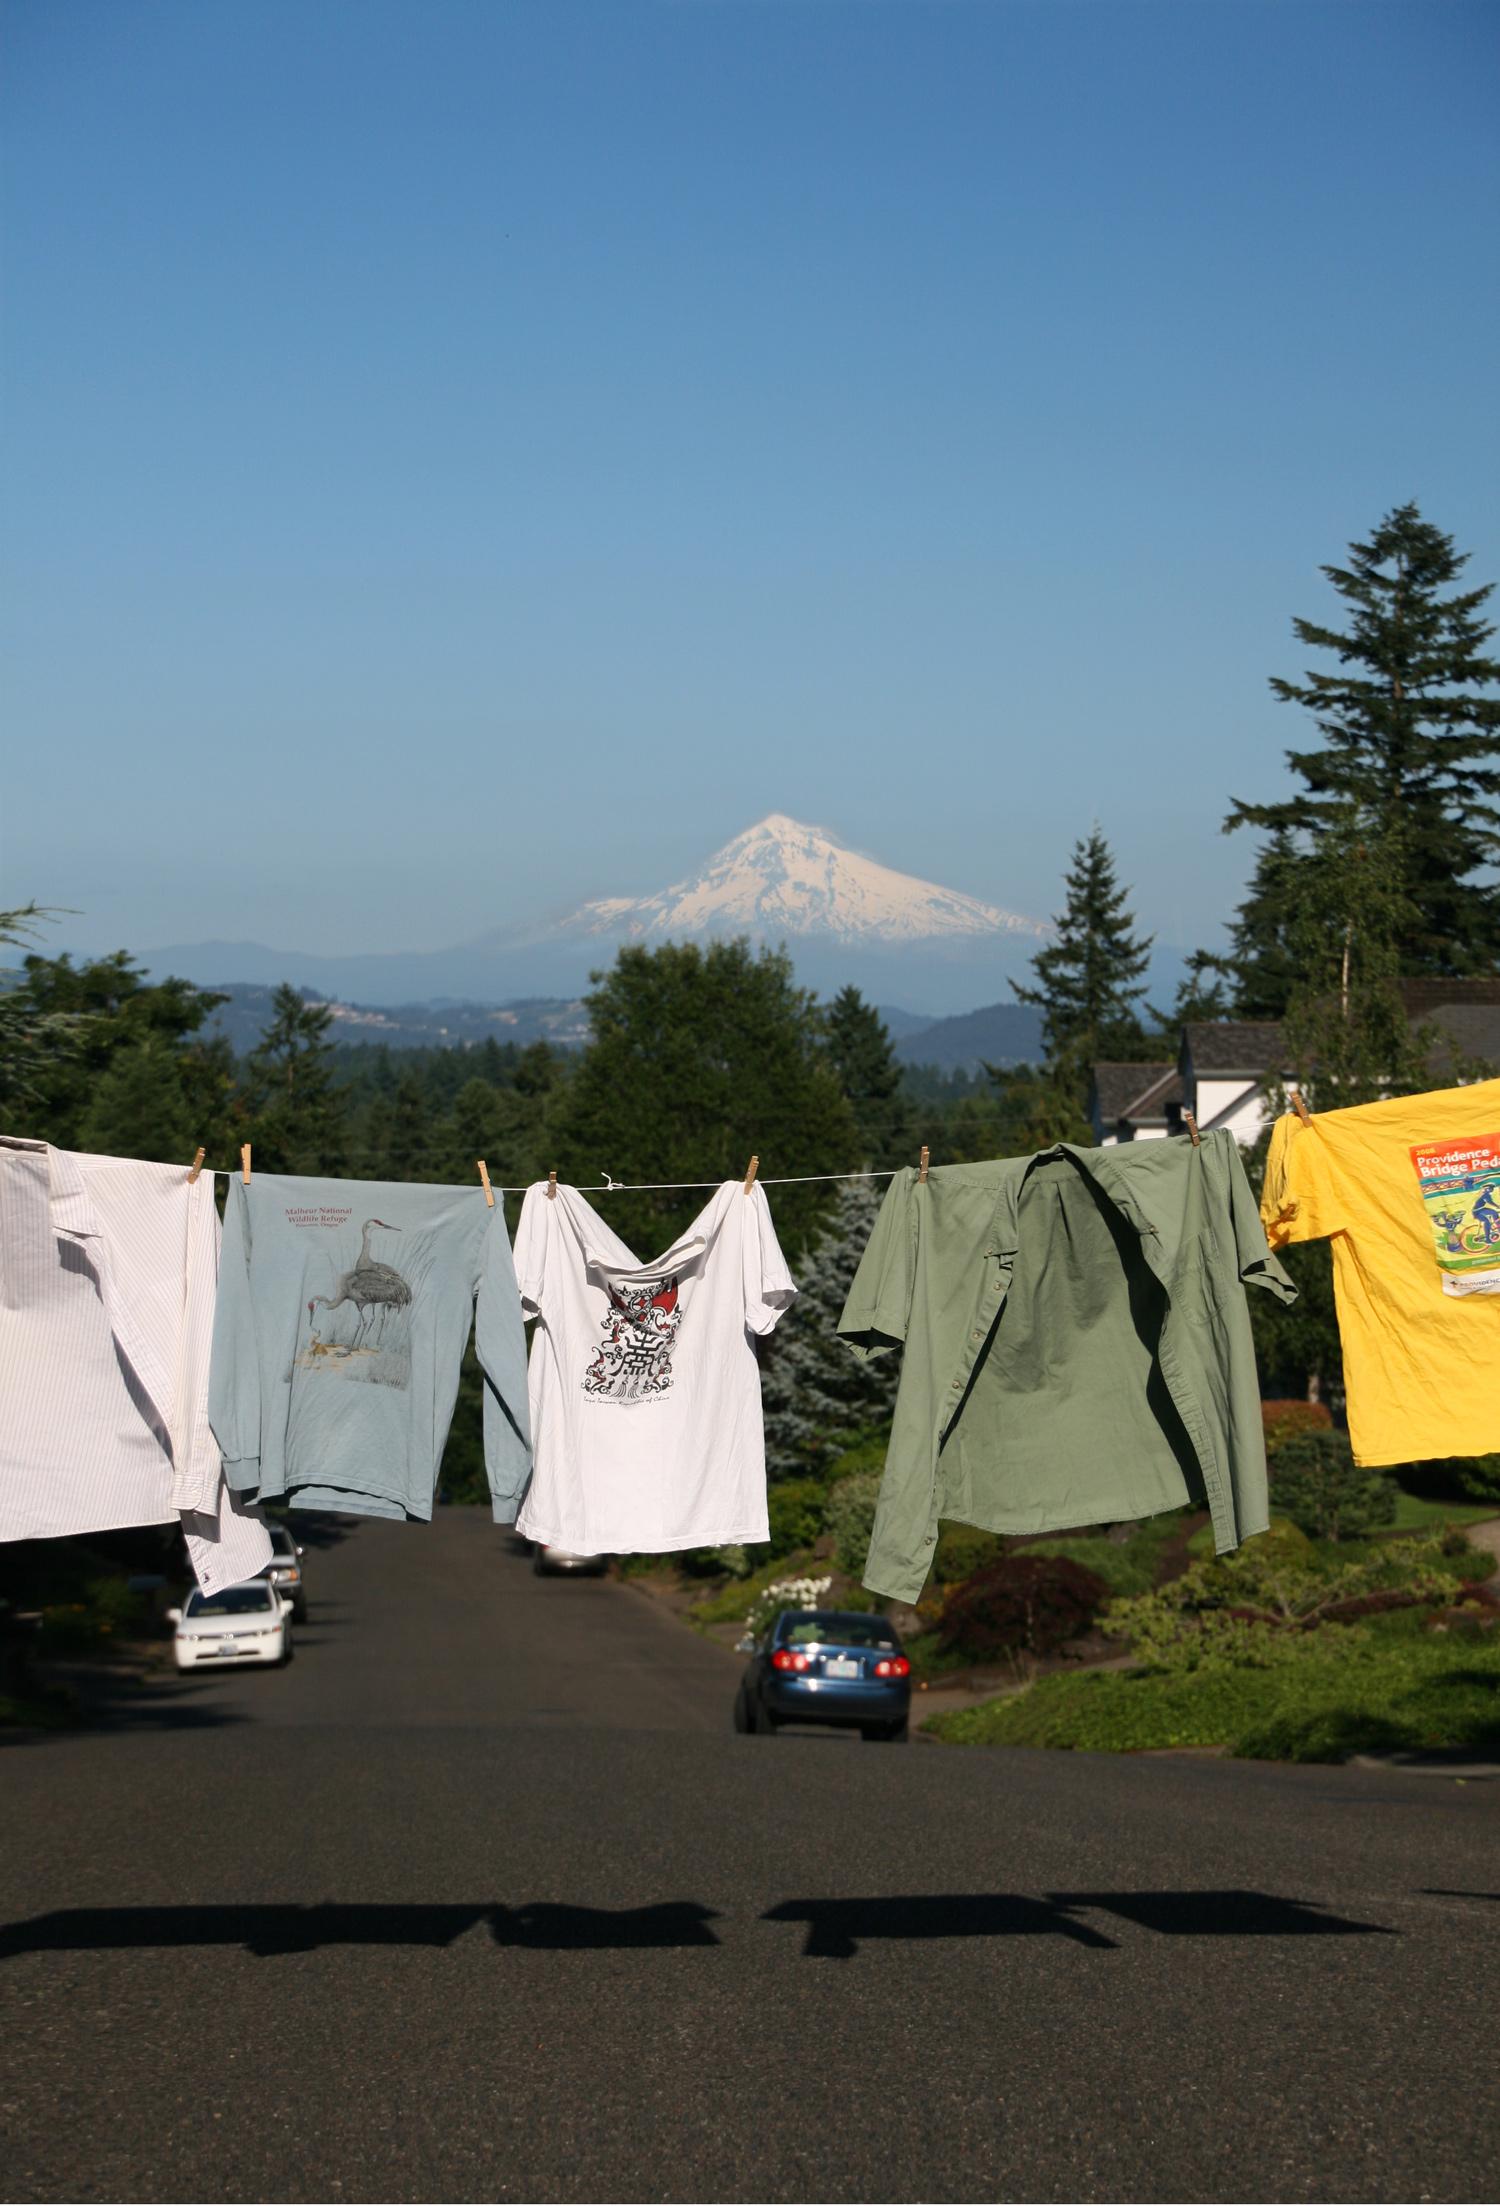 laundryMazePostcard.jpg